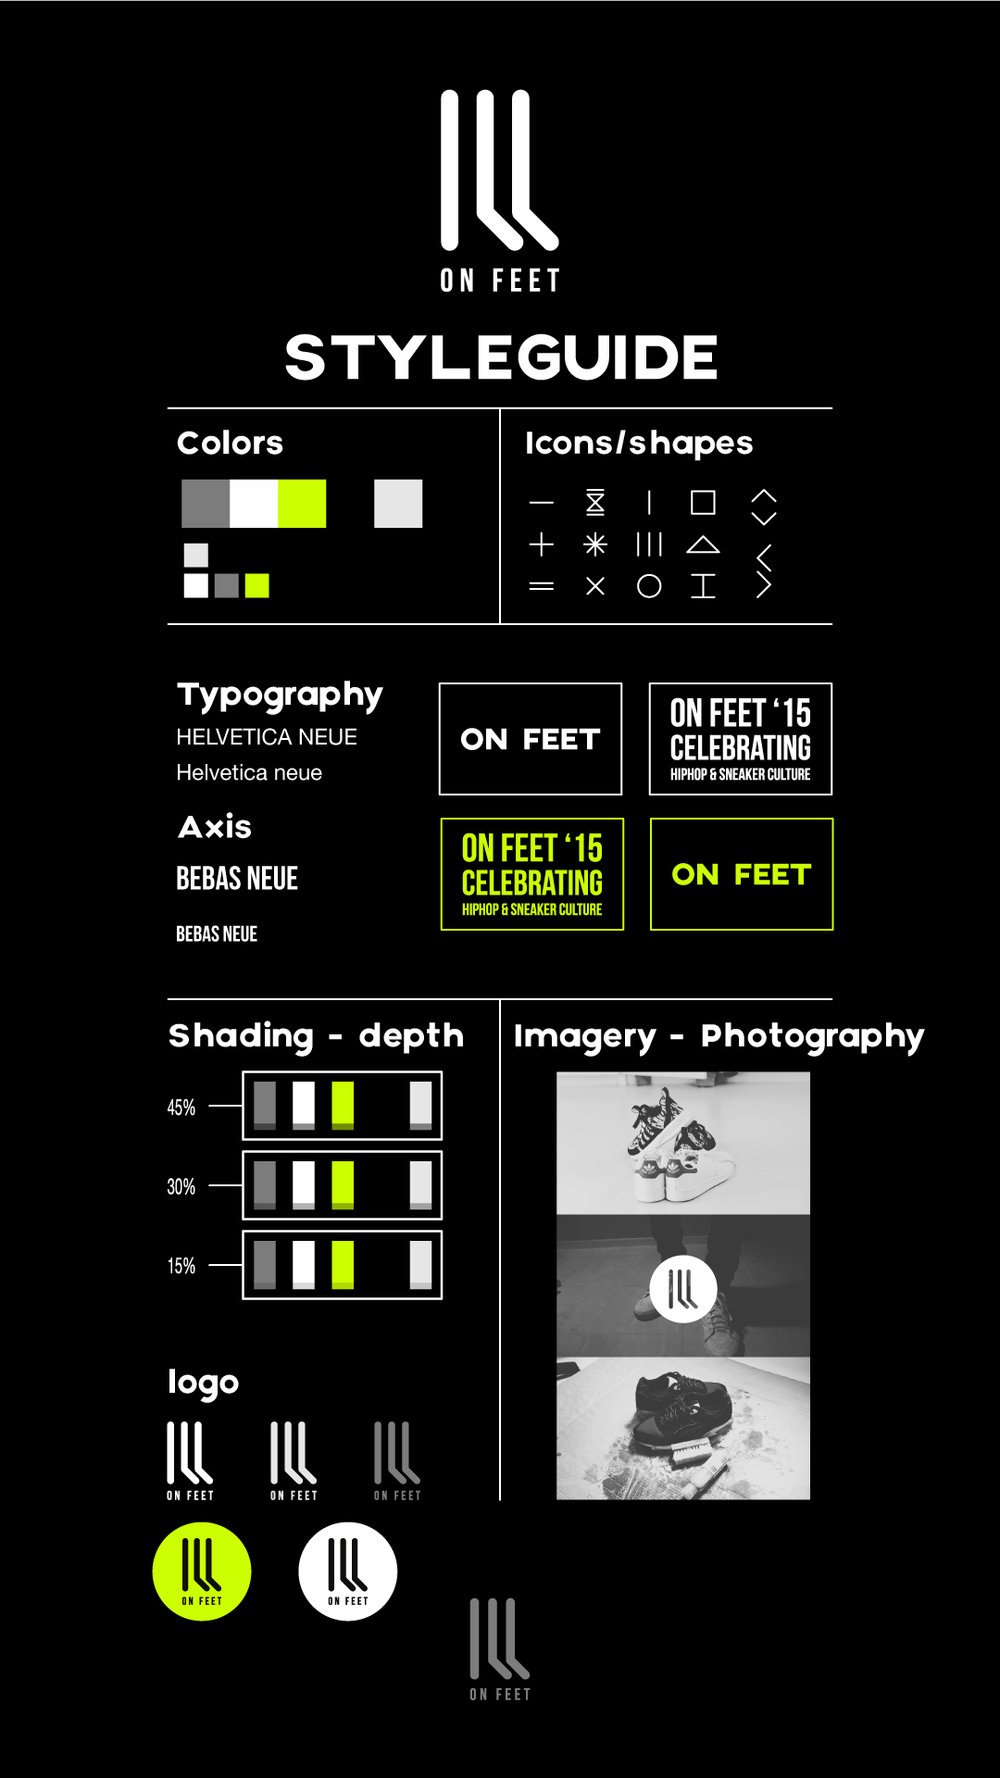 On_feet_styleguide.jpg